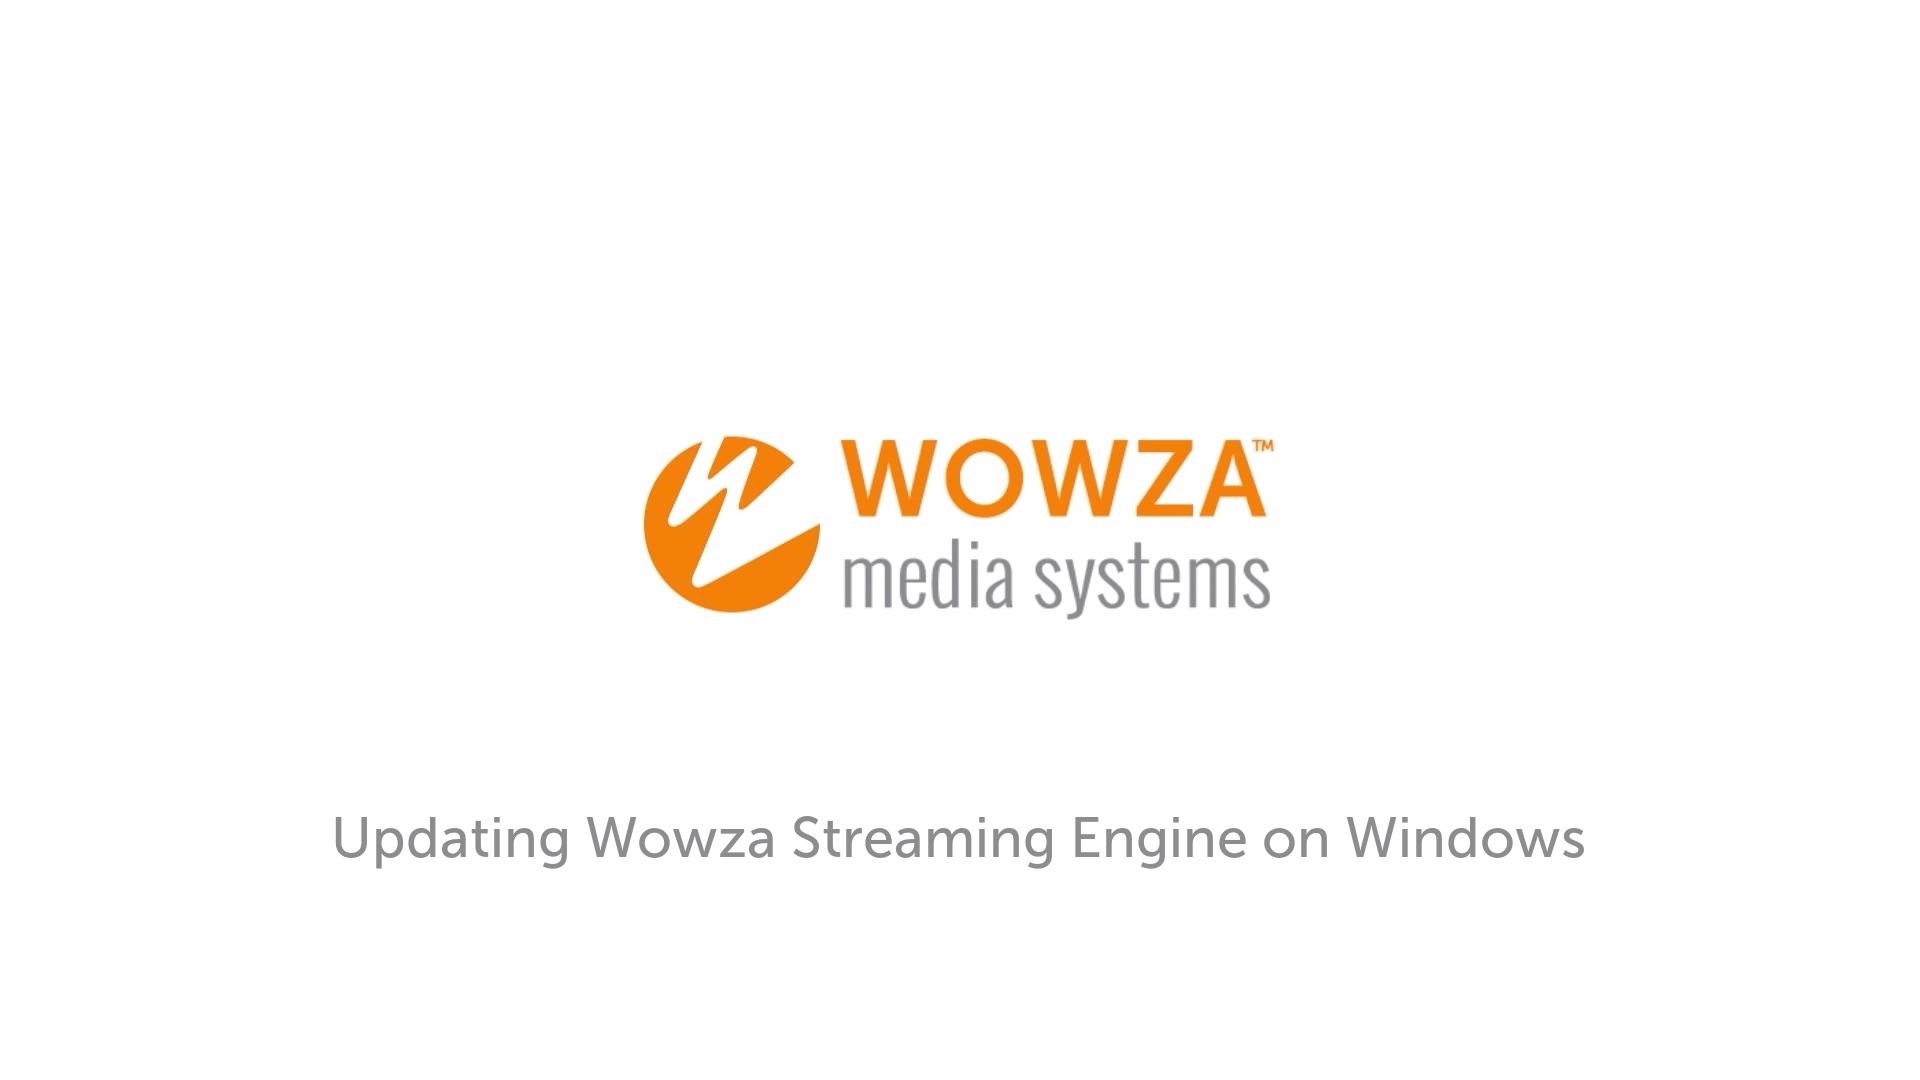 Update Wowza Streaming Engine